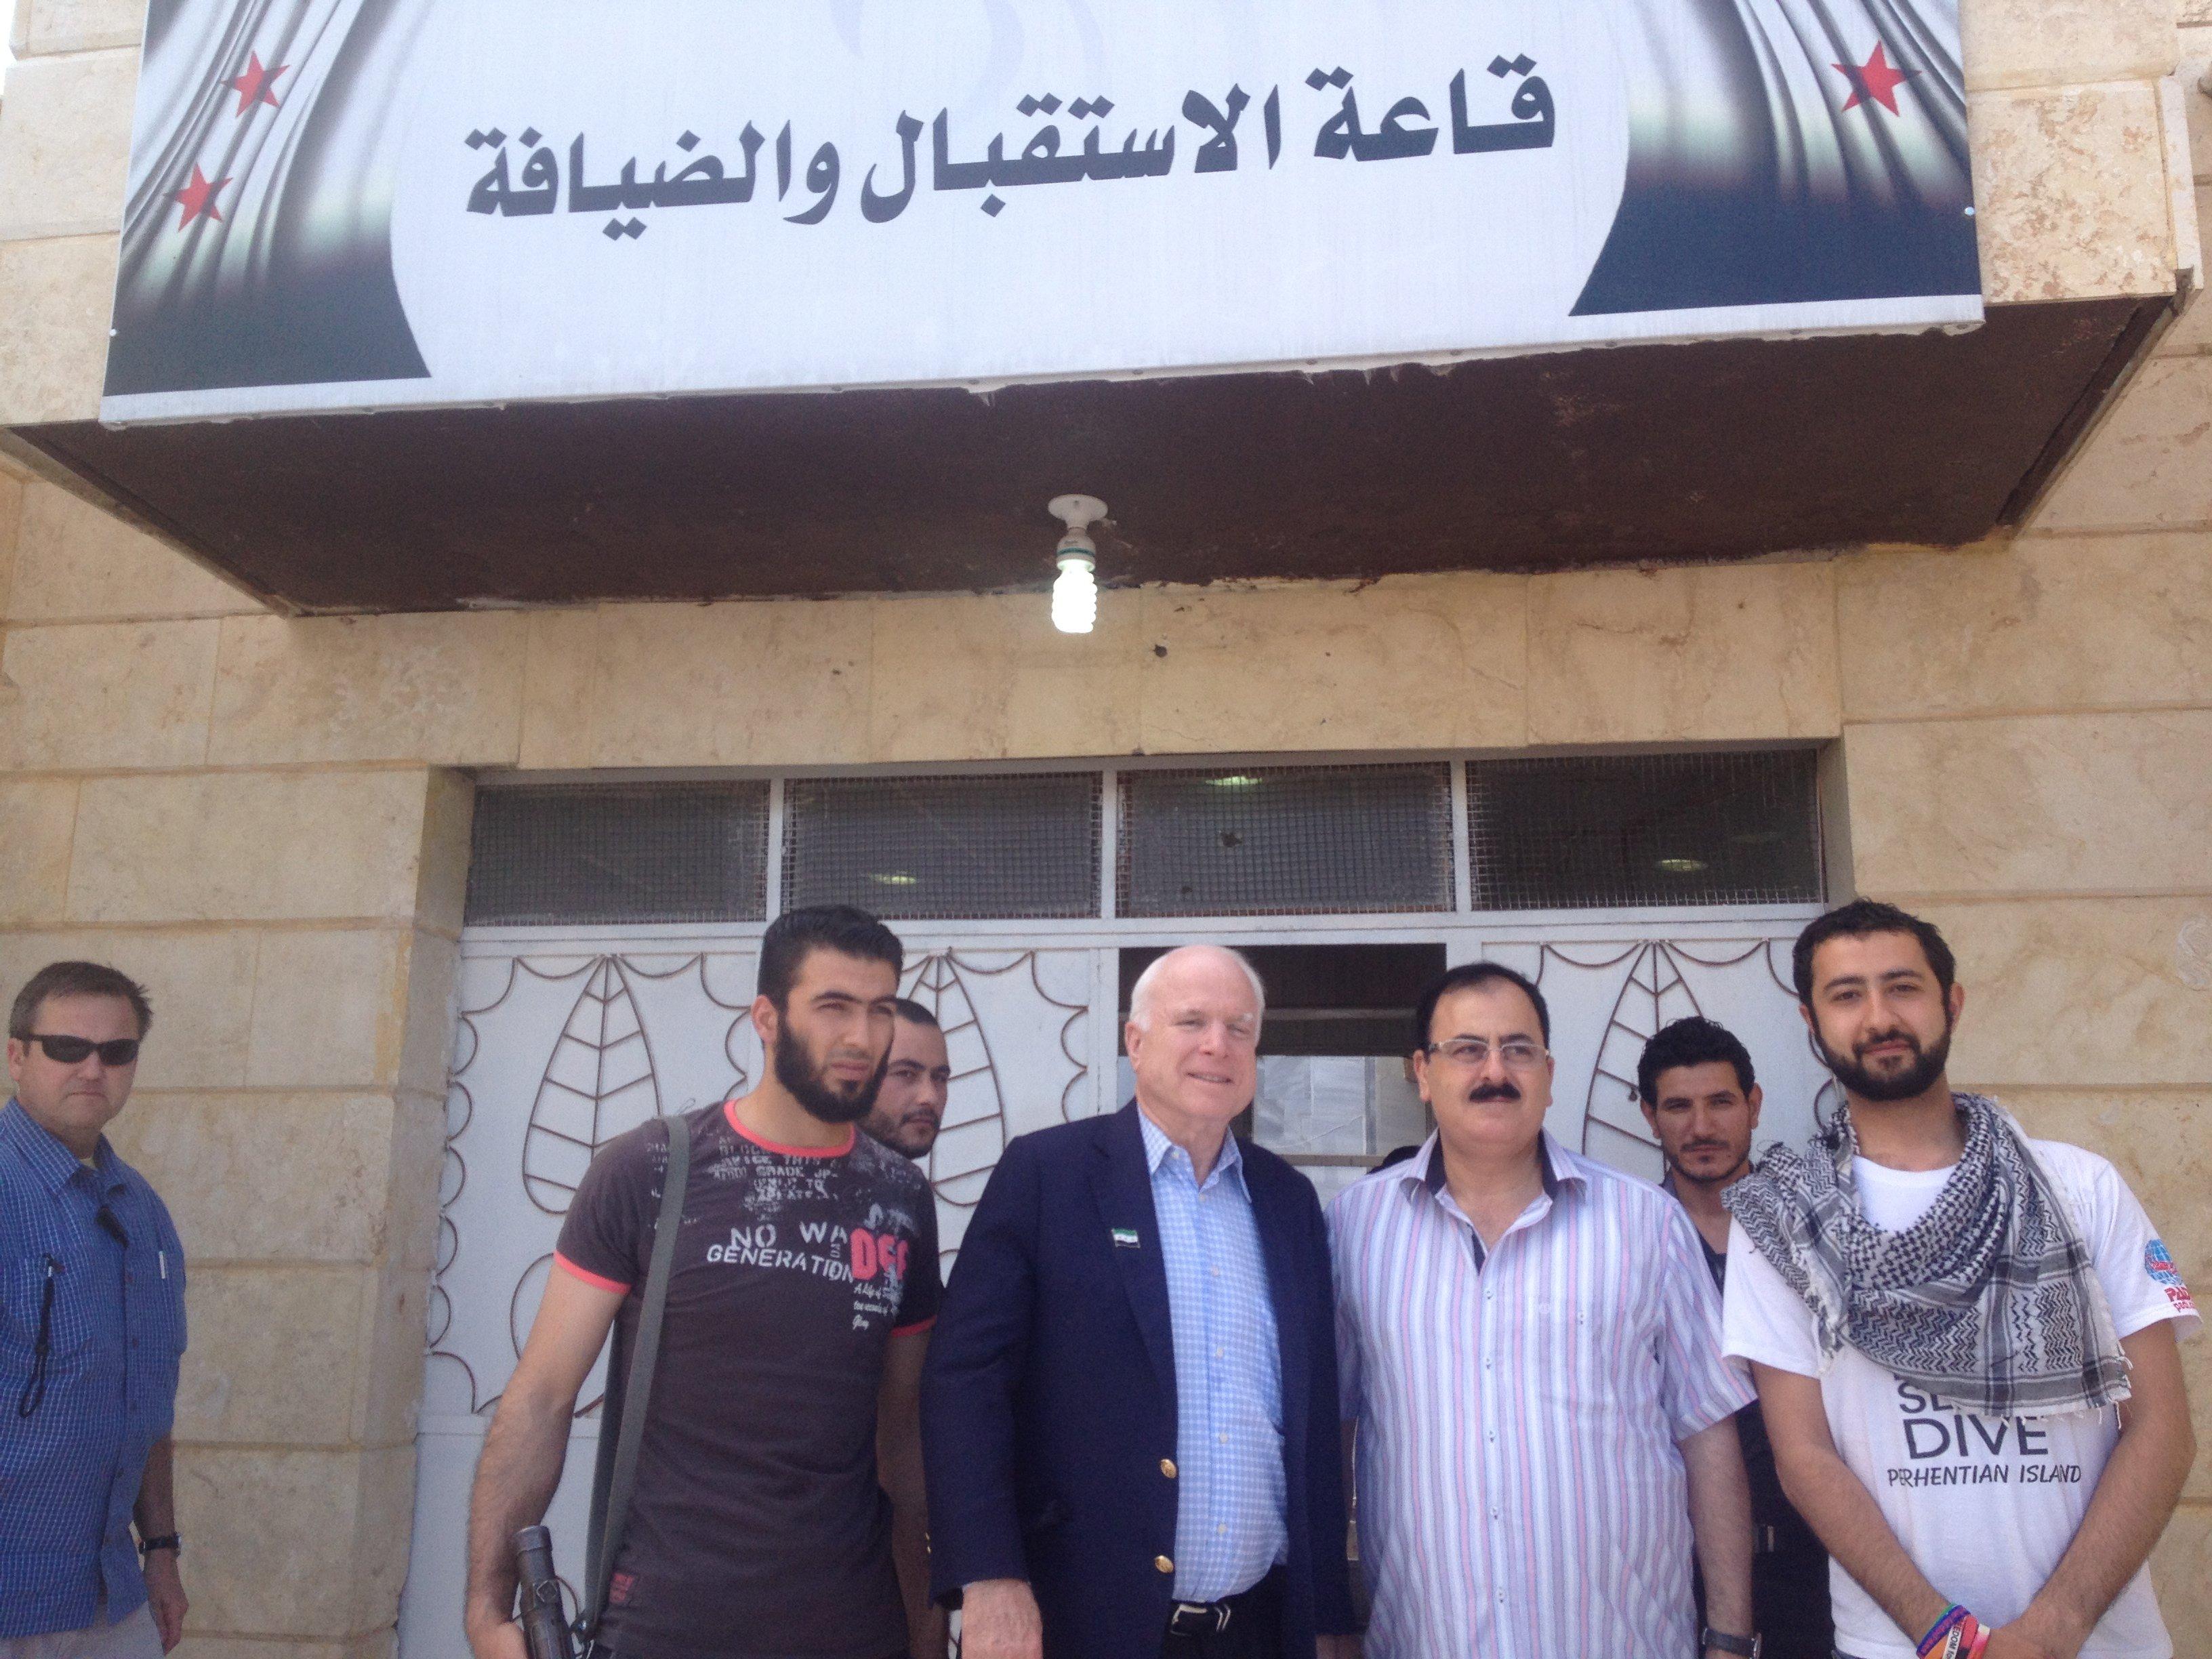 McCain visits rebels in Syria